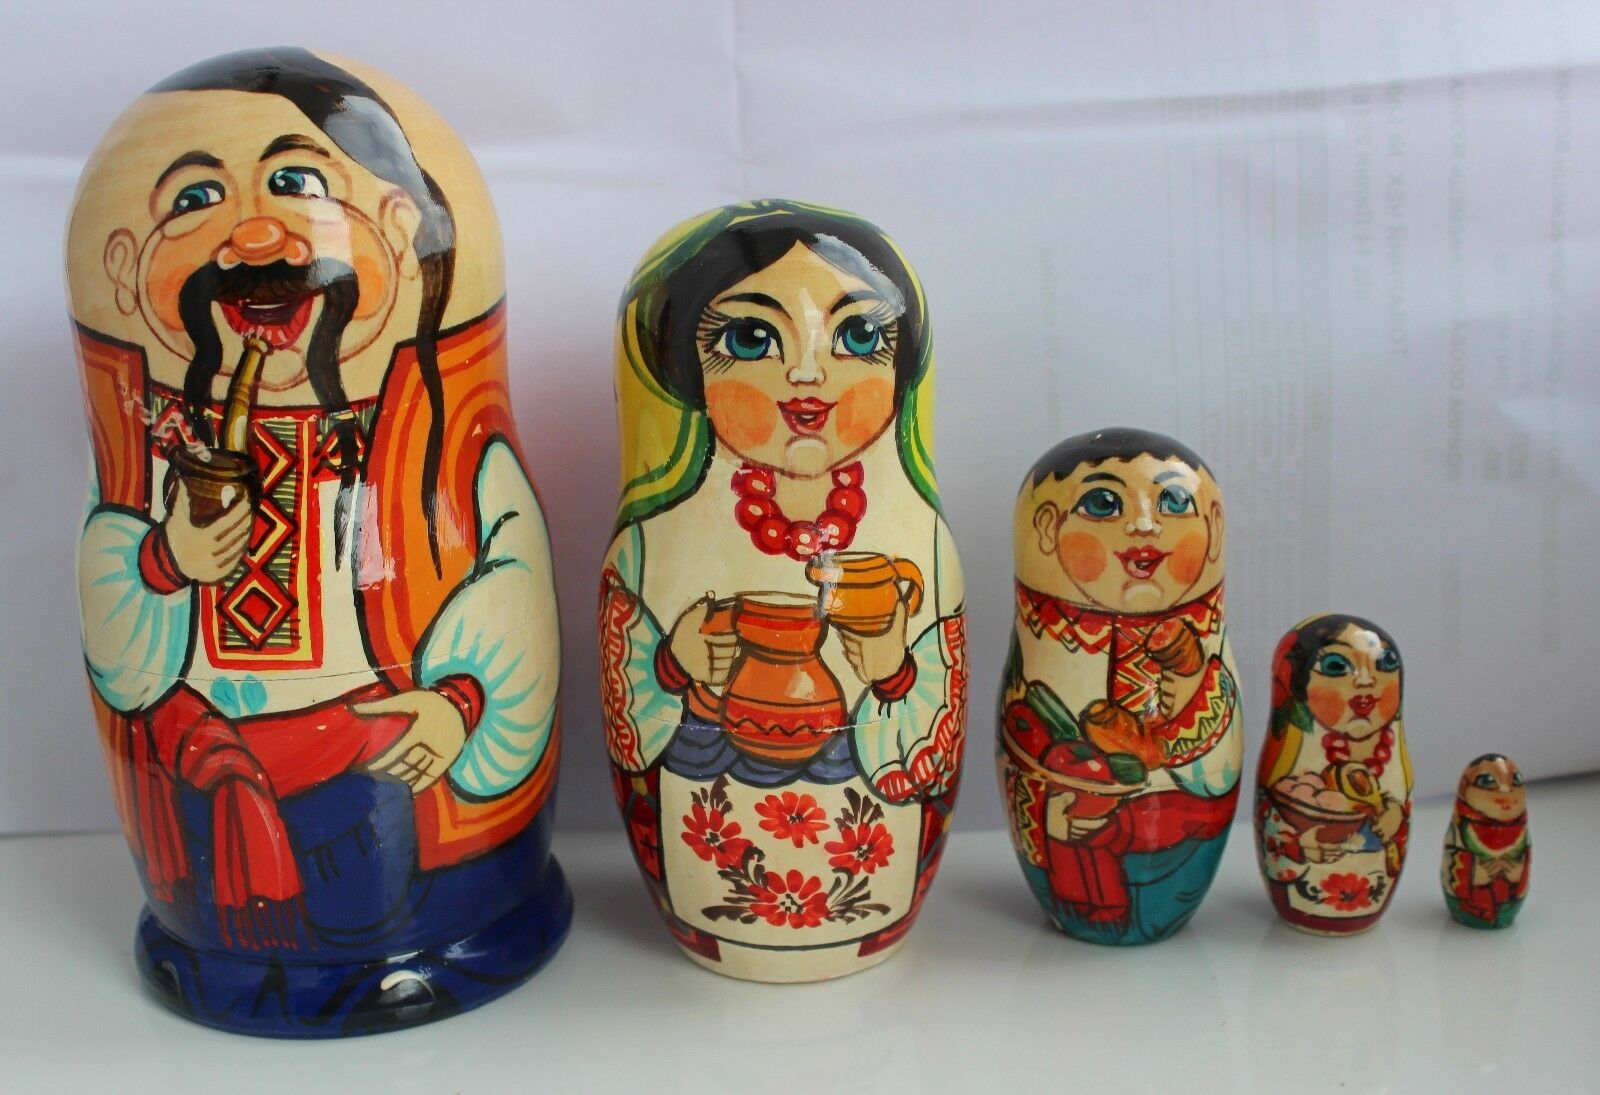 Ukraine Nesting dolls h=14 cm Matryoshka 5pc Ukrainians hand souvenir